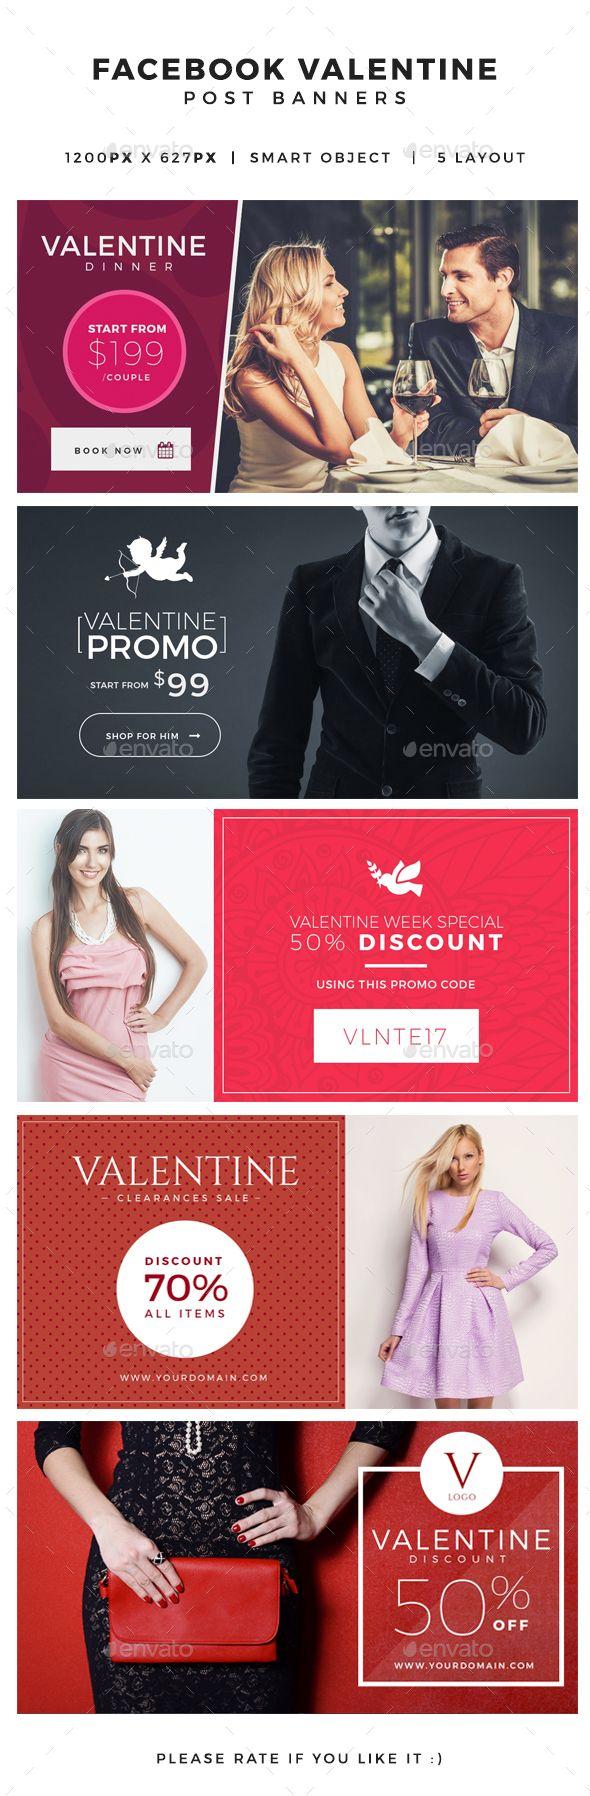 Valentine Facebook Post Banners,ads, banner, boutique, creative, discount, ecommerce, facebook, facebook post, festival, gift, love, modern, pink, post, promo, promotion, romance, sale, sale season, shop, valentine